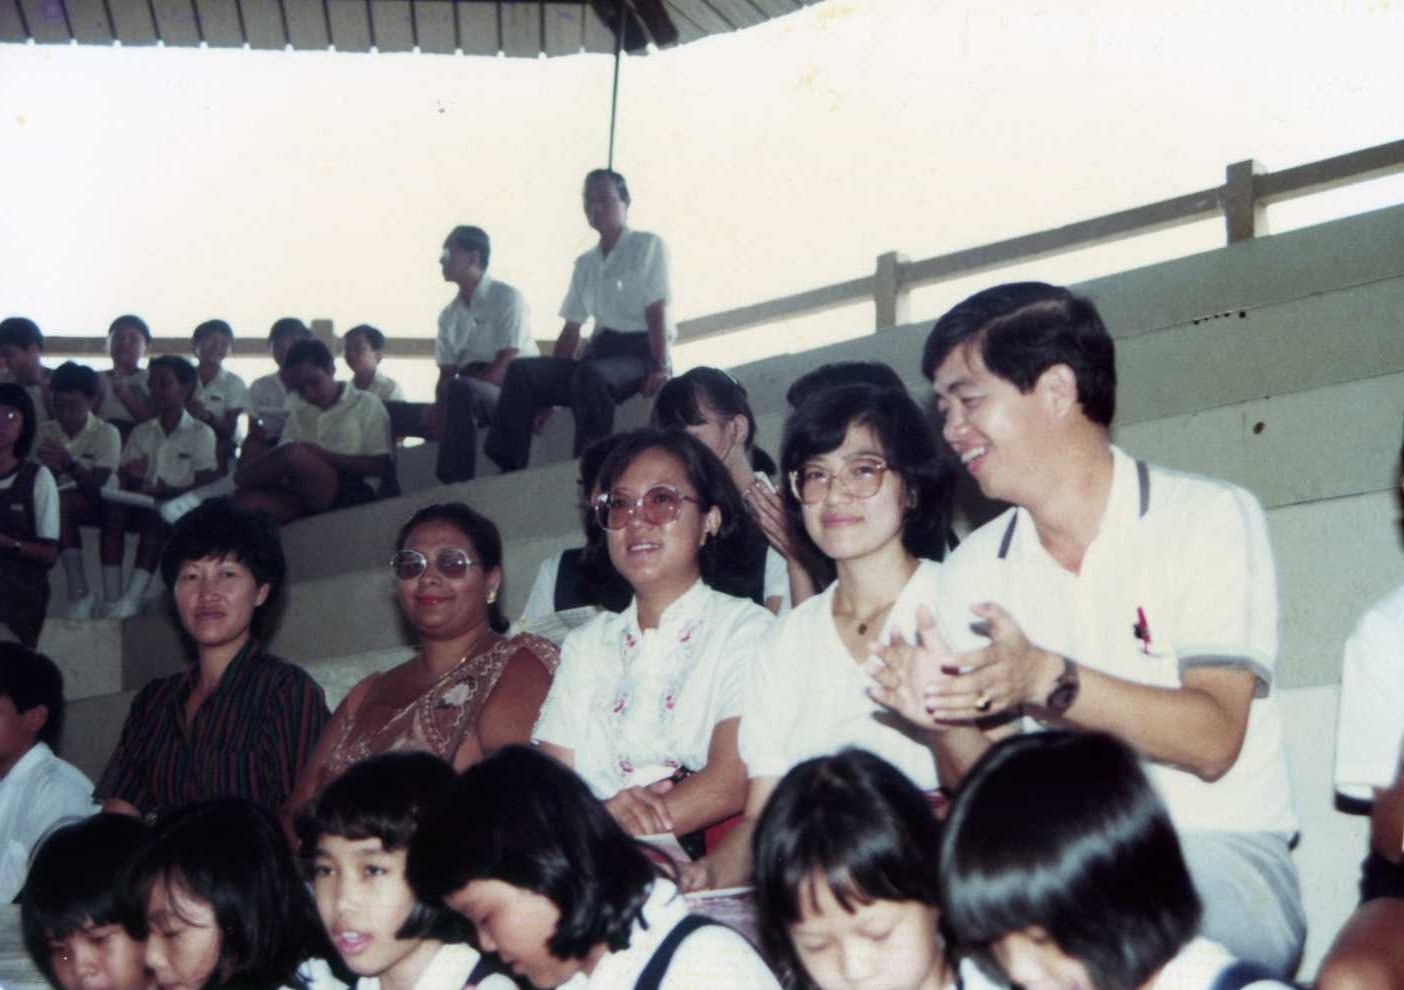 Yeo Hong Eng 2011 Lgs Slim Fit Youth Boy Giant Leap Merah M Teachers At The Festival Jalan Besar Stadium